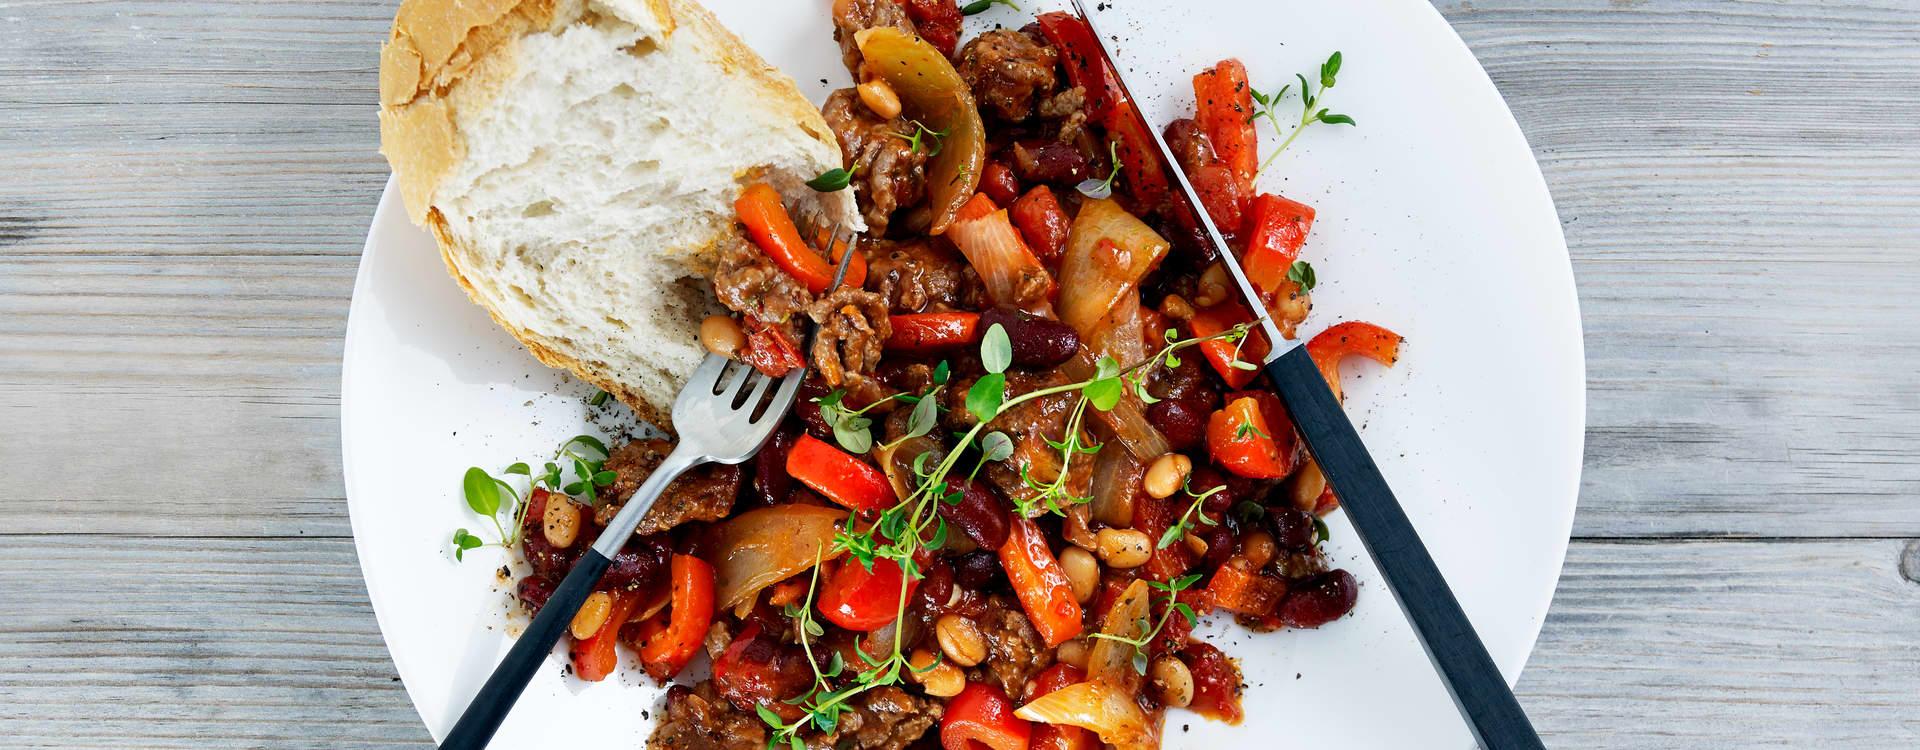 Kjøttdeig chili con carne